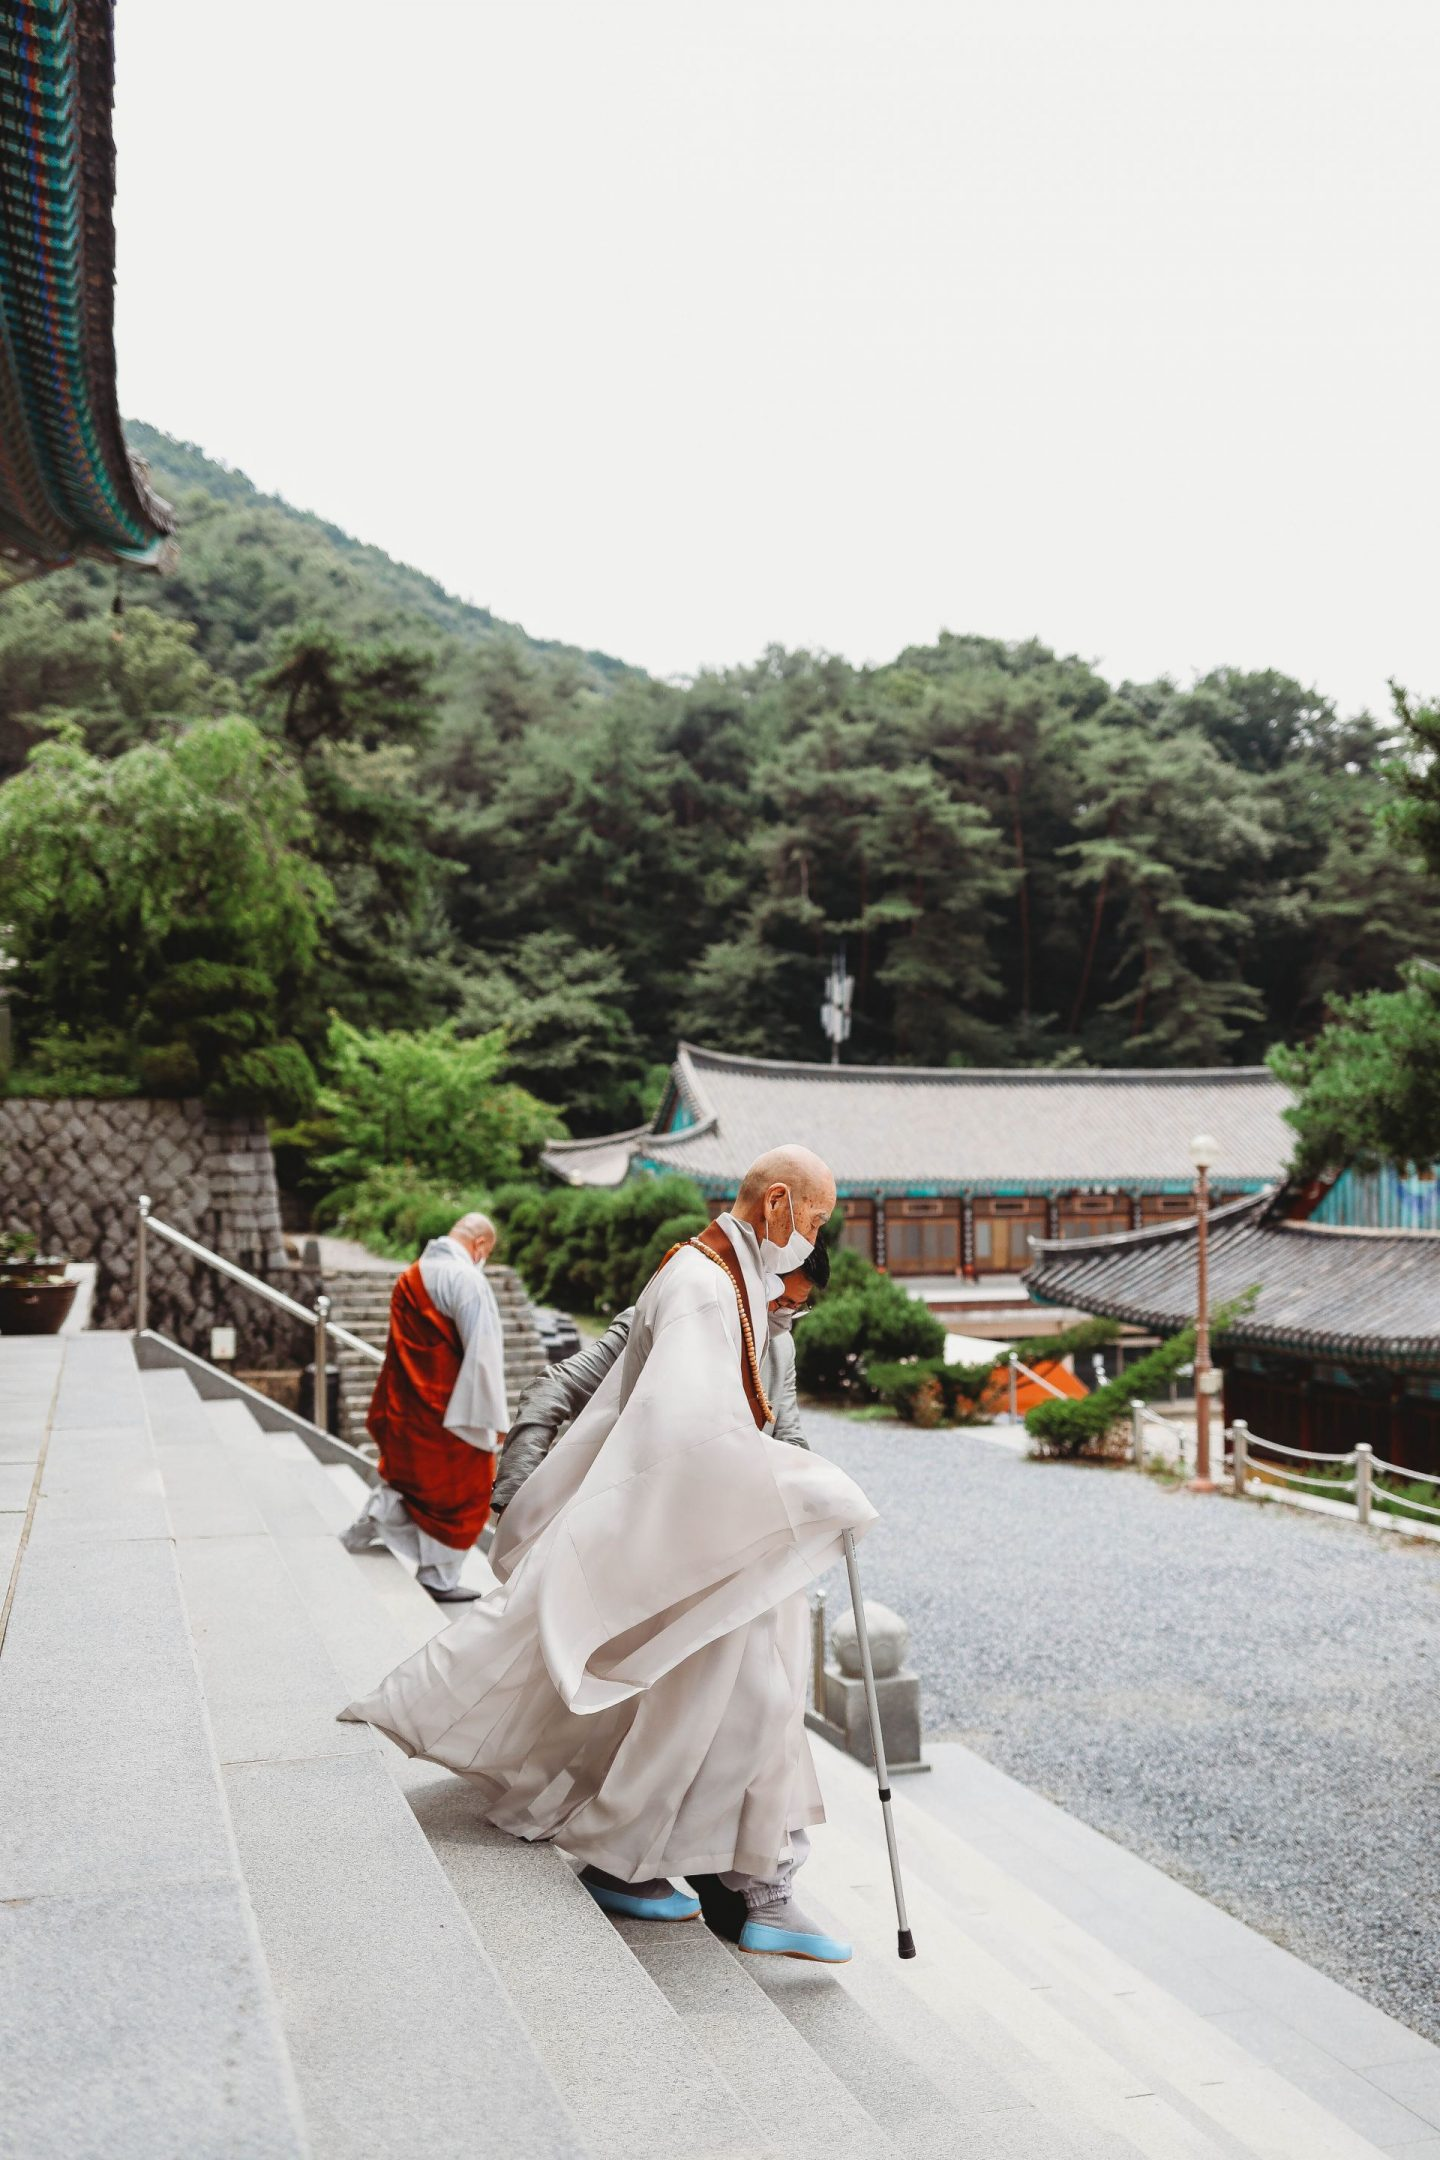 visiting gakwonsa temple in cheonan